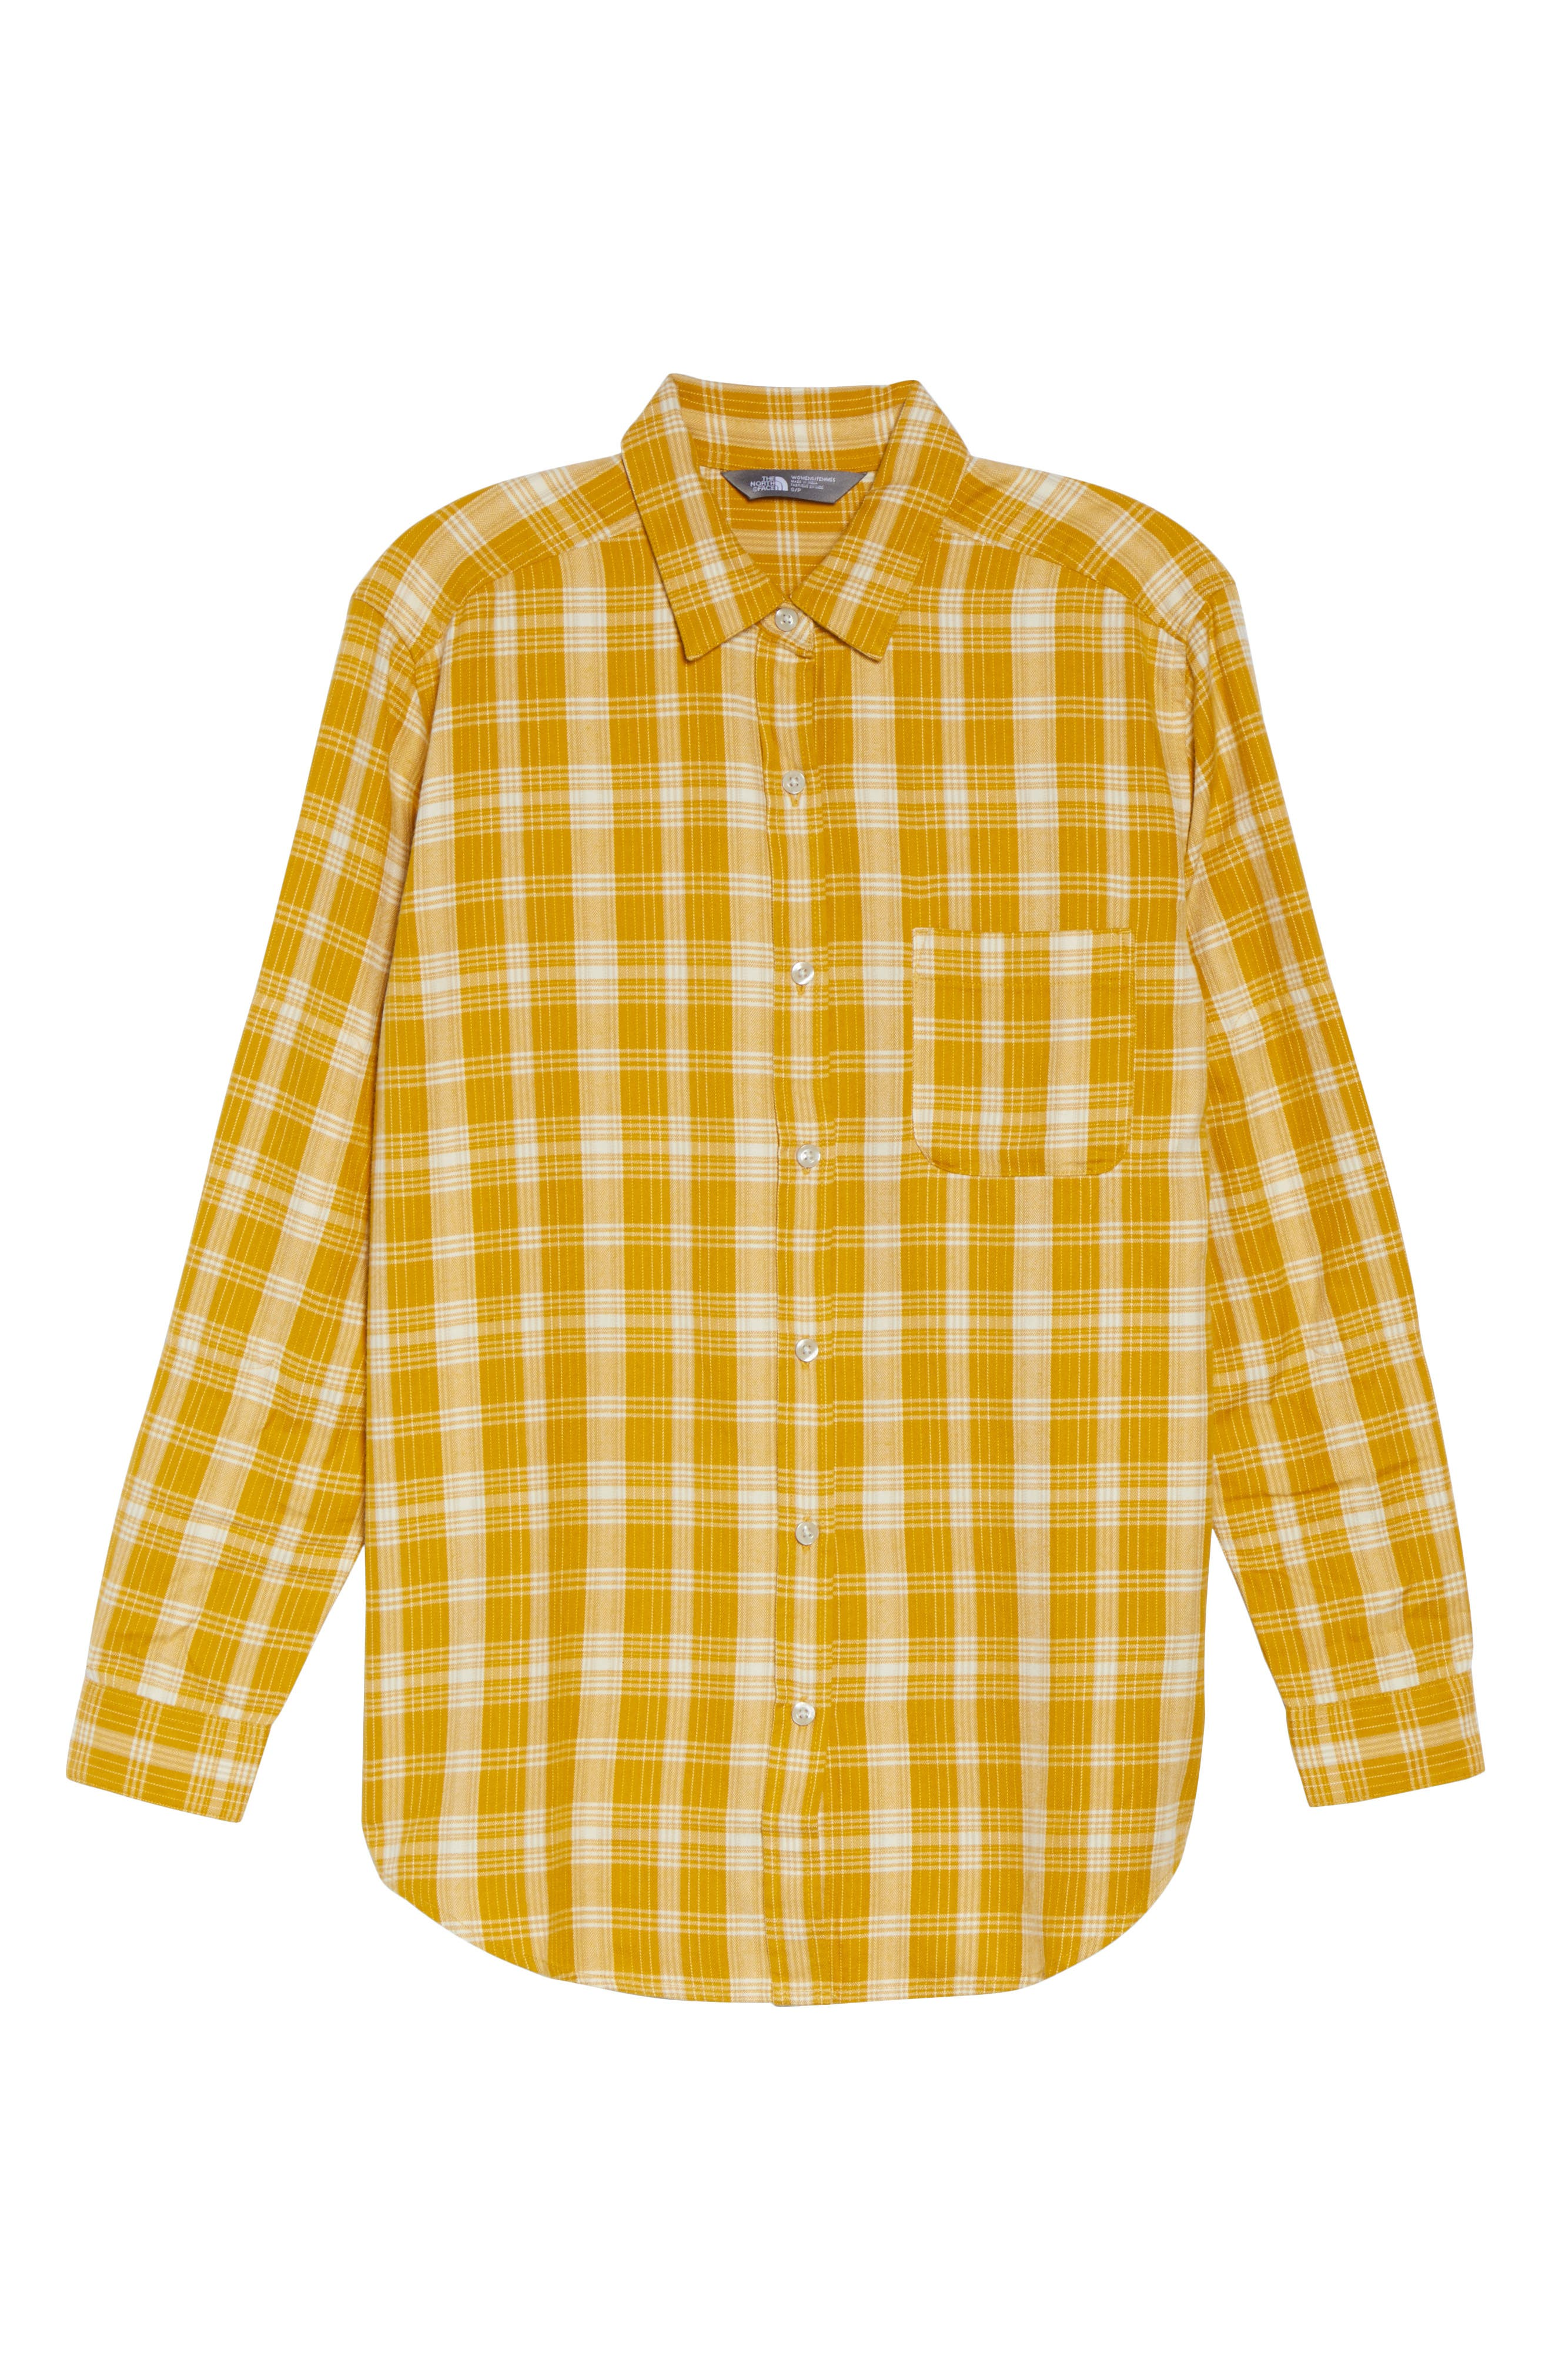 Boyfriend Shirt,                             Alternate thumbnail 7, color,                             Arrowwood Yellow Plaid